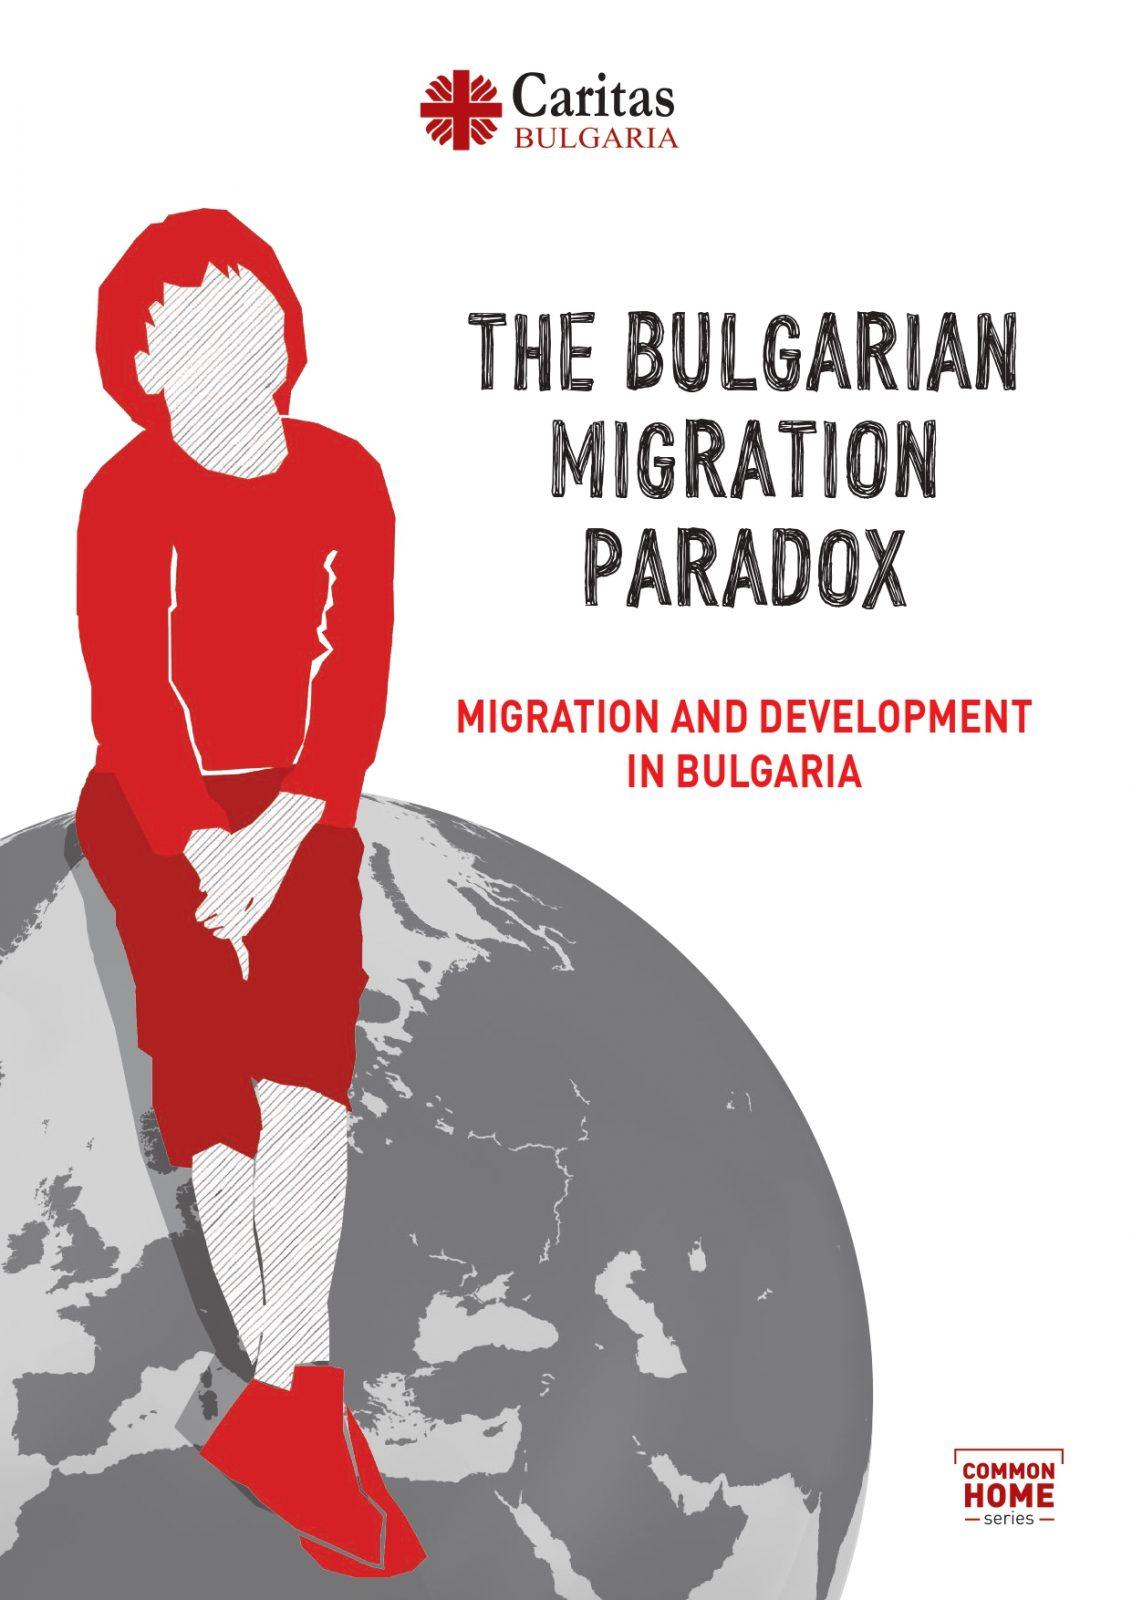 The Bulgarian Migration Paradox